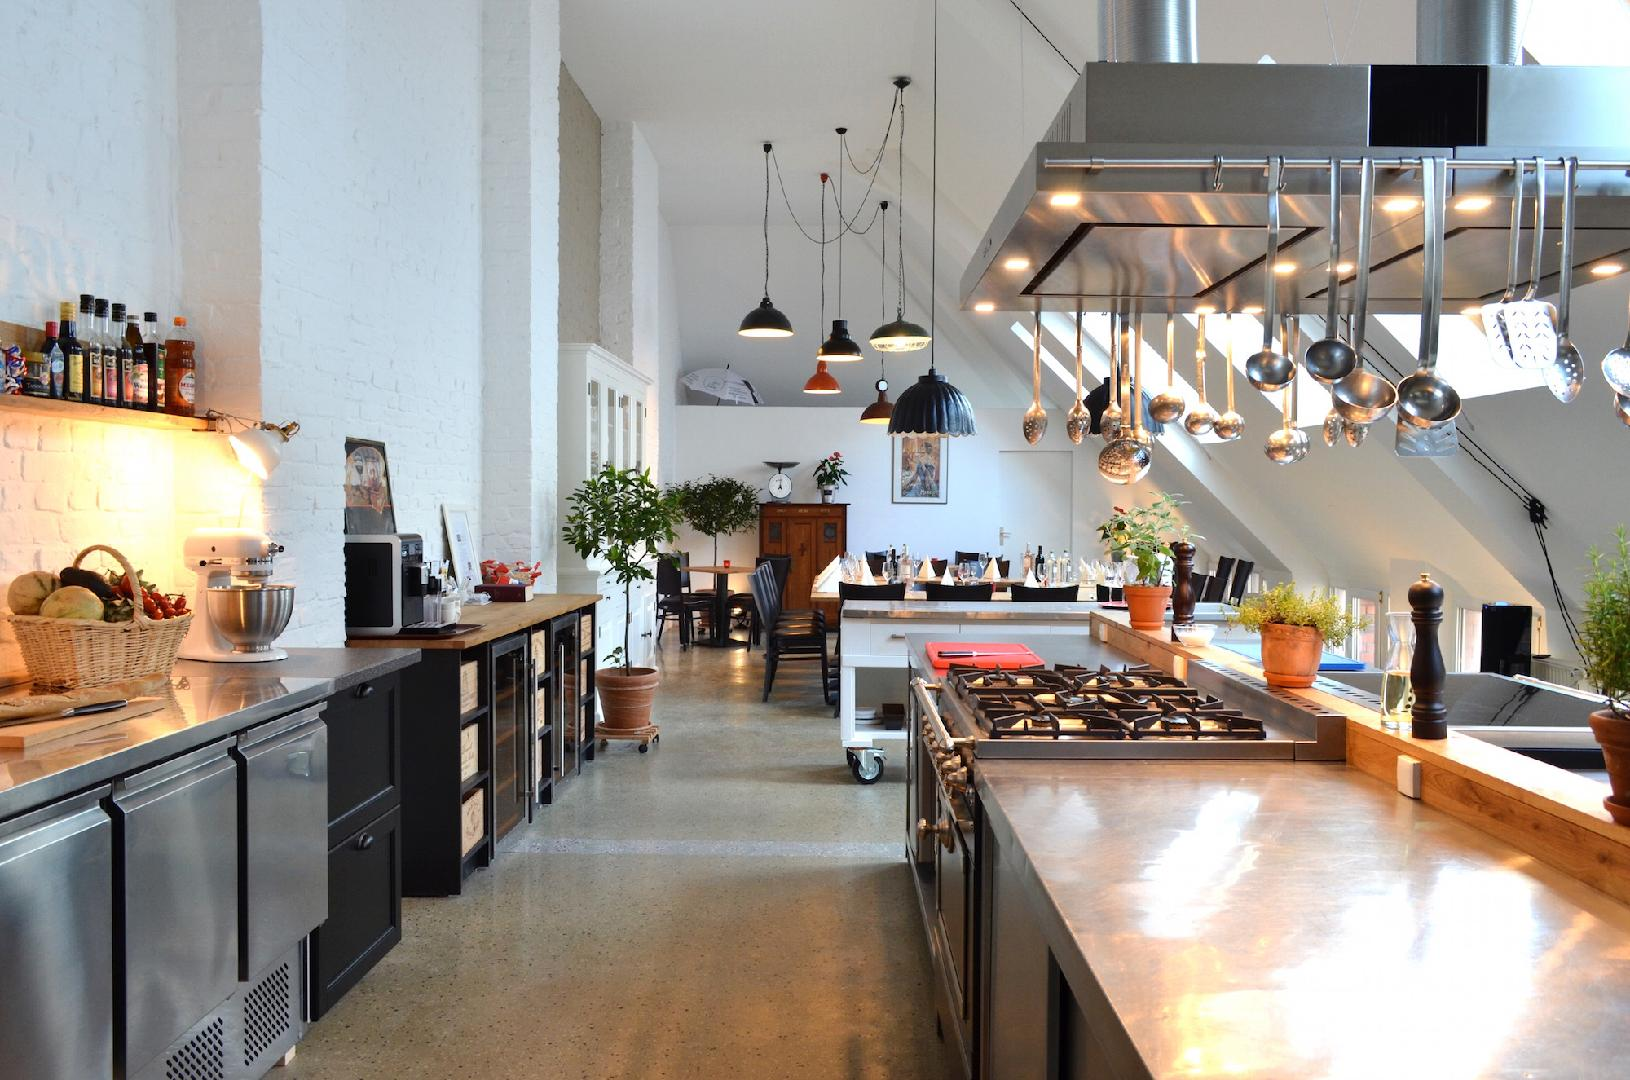 Kochstudio  Event-Kochstudio Club culinaire – Loft, Eventlocation ...